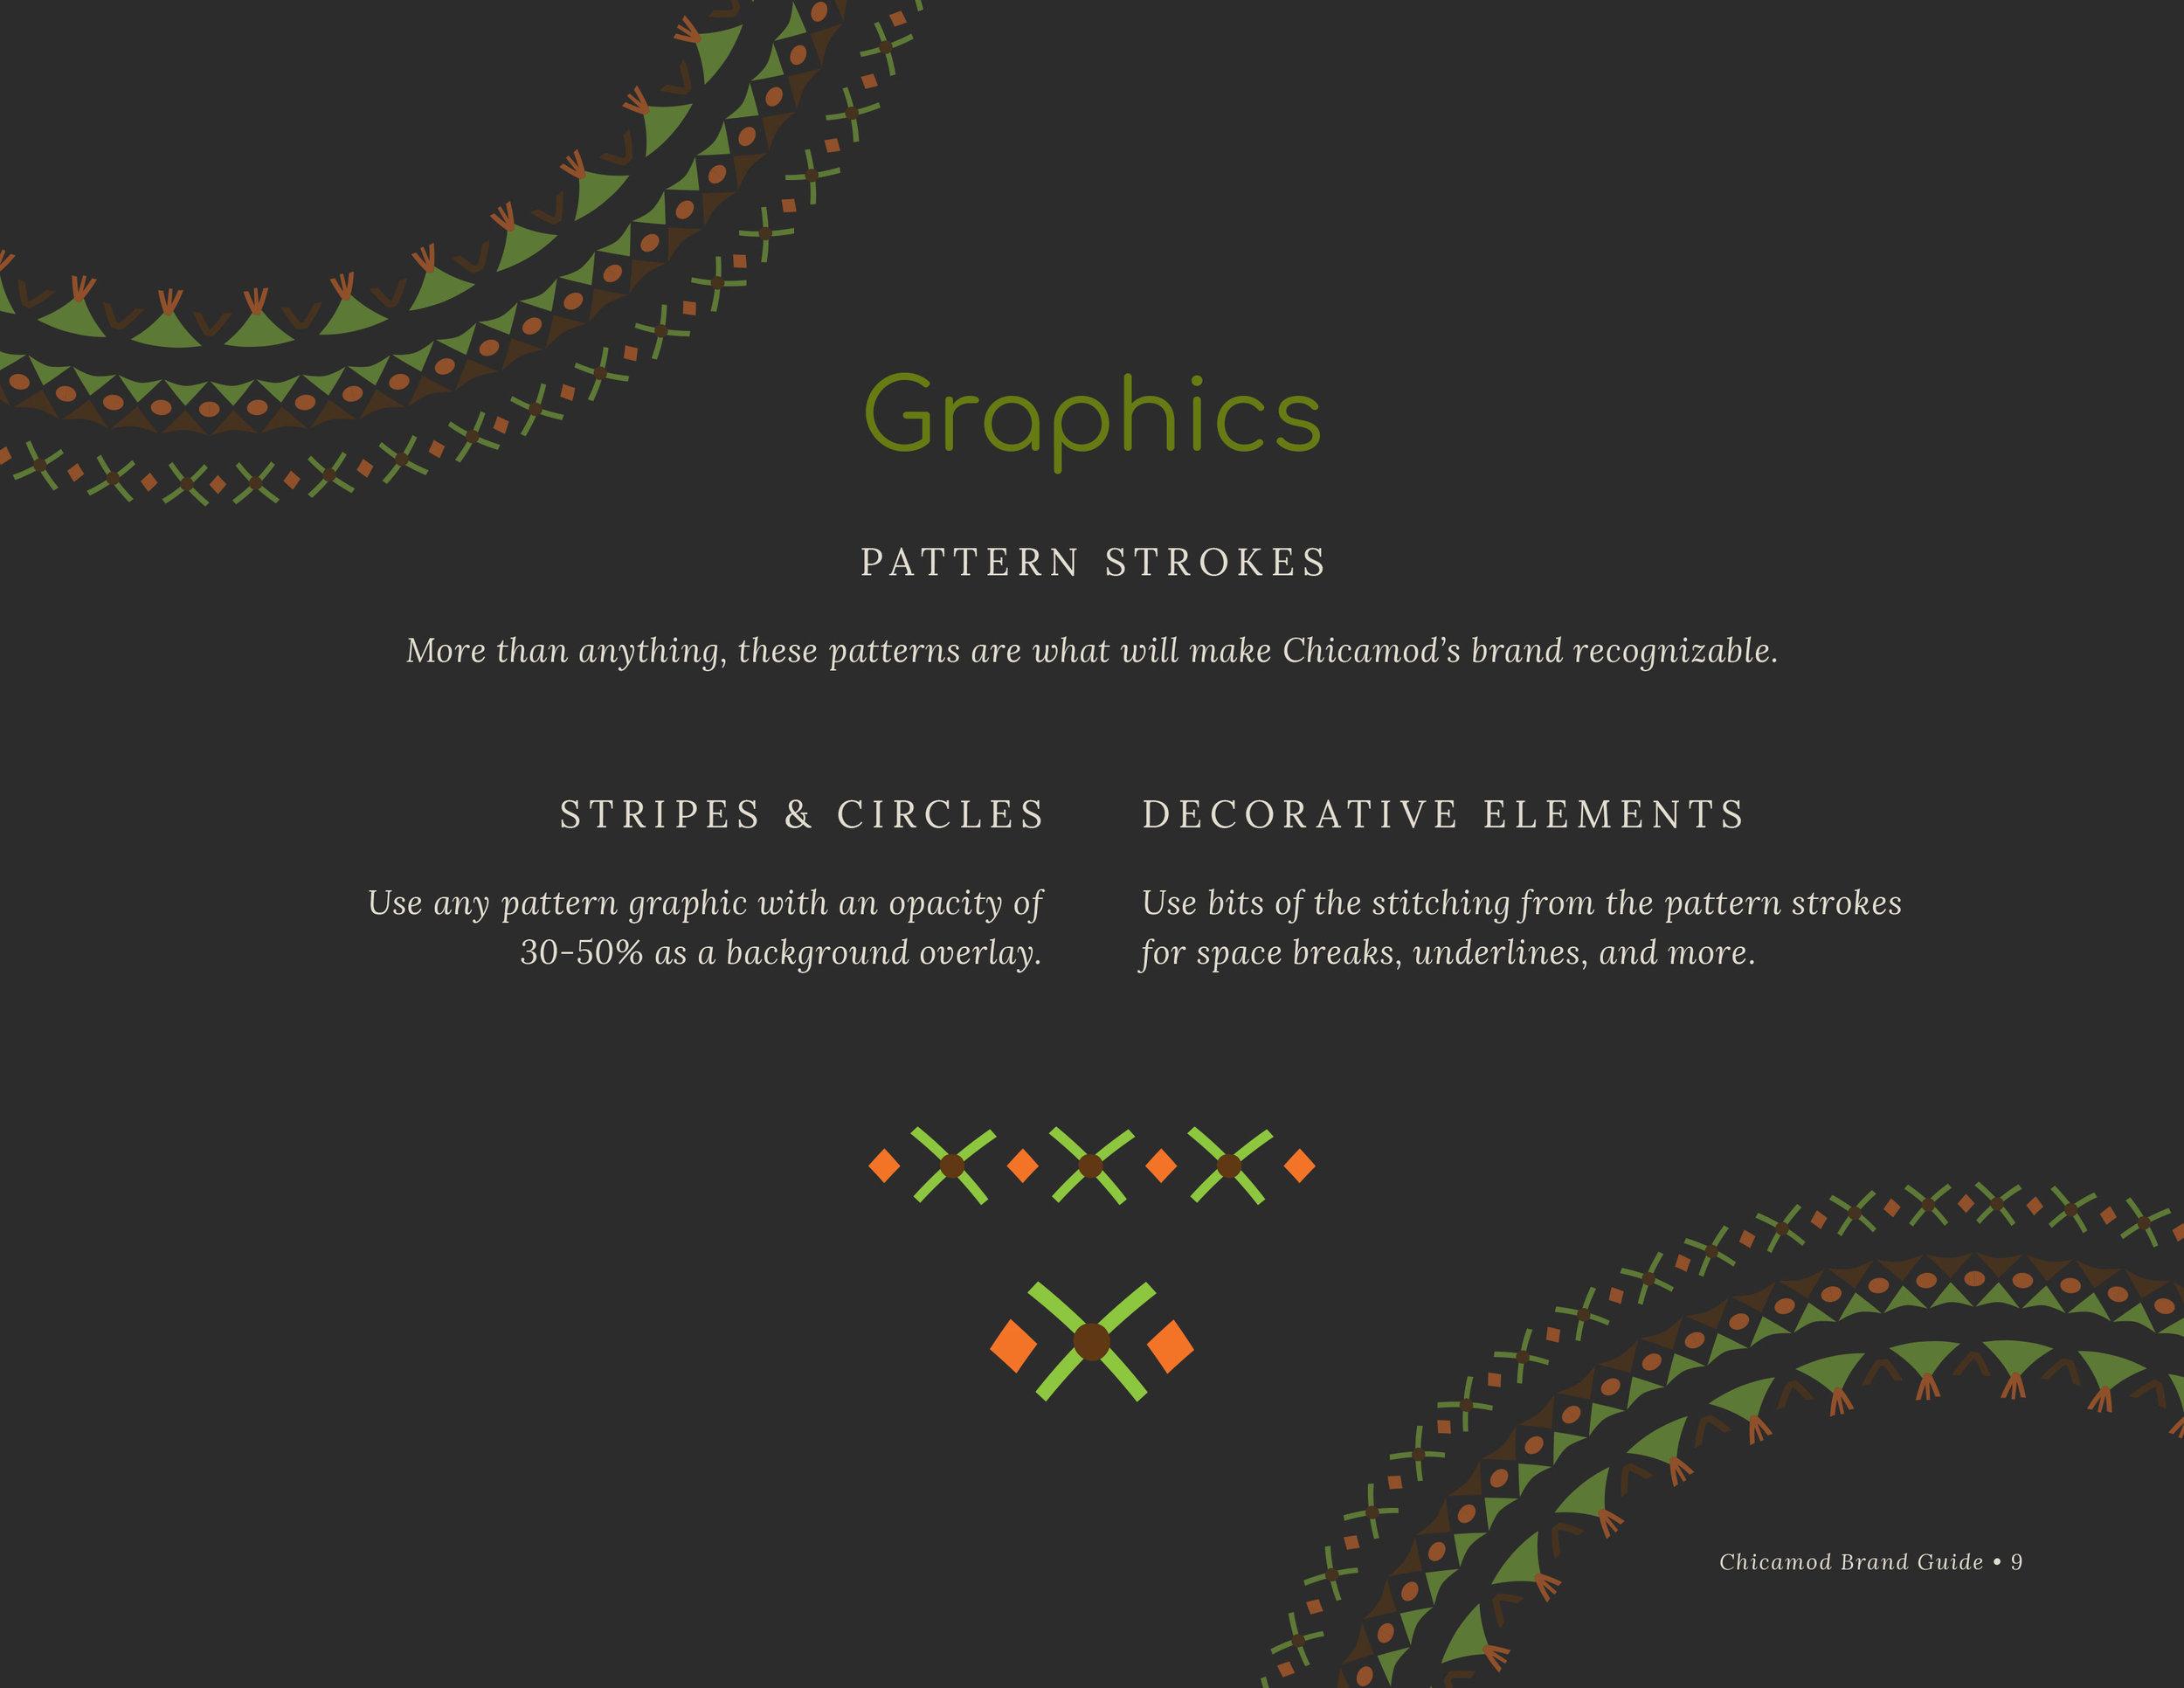 Chicamod-Brand-Guide-9.jpg